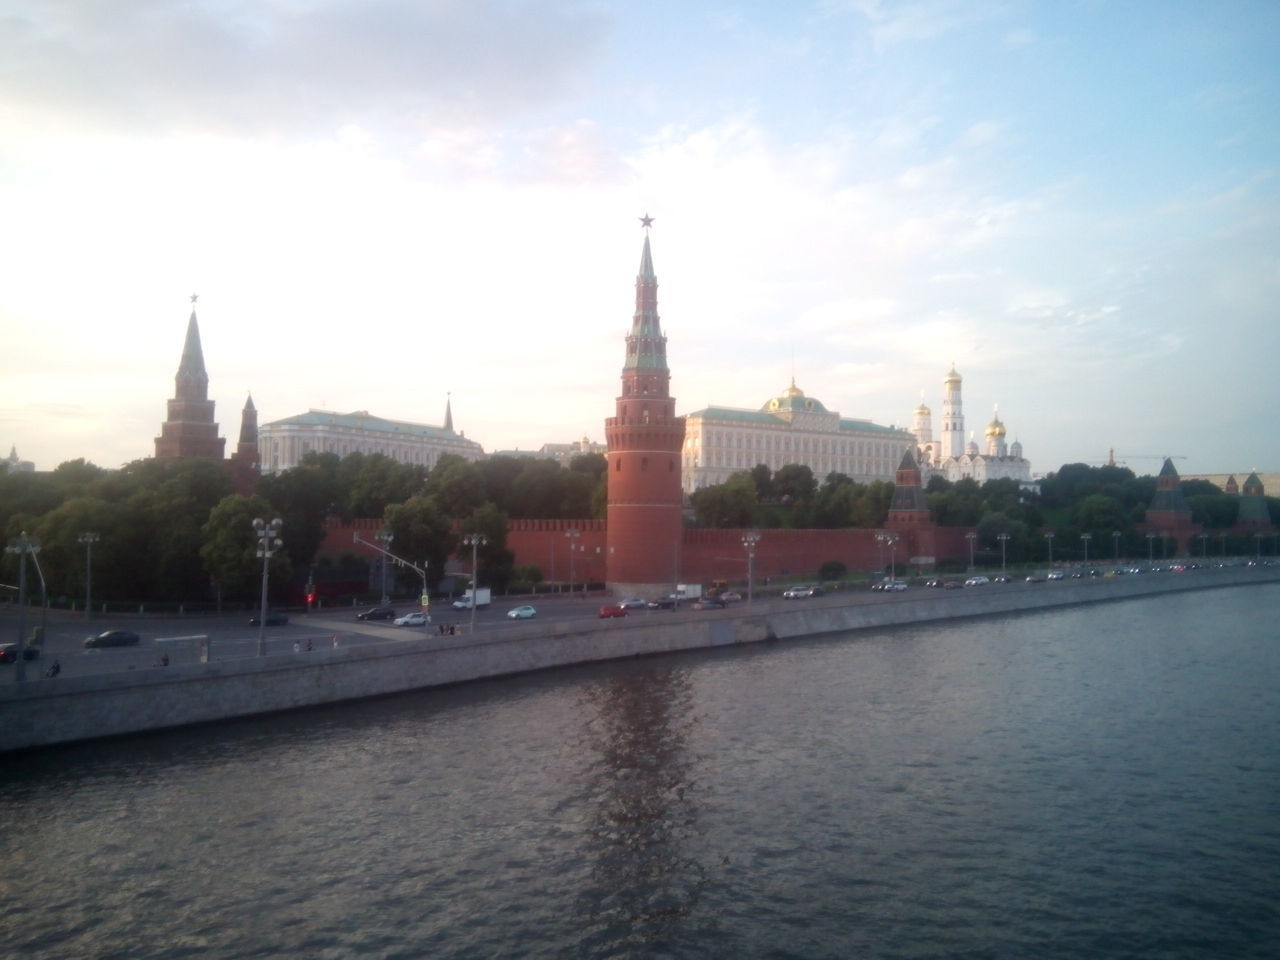 Tower Architecture Travel Sky москва Russia Москва Кремль Московский Кремль МосковскийКремль